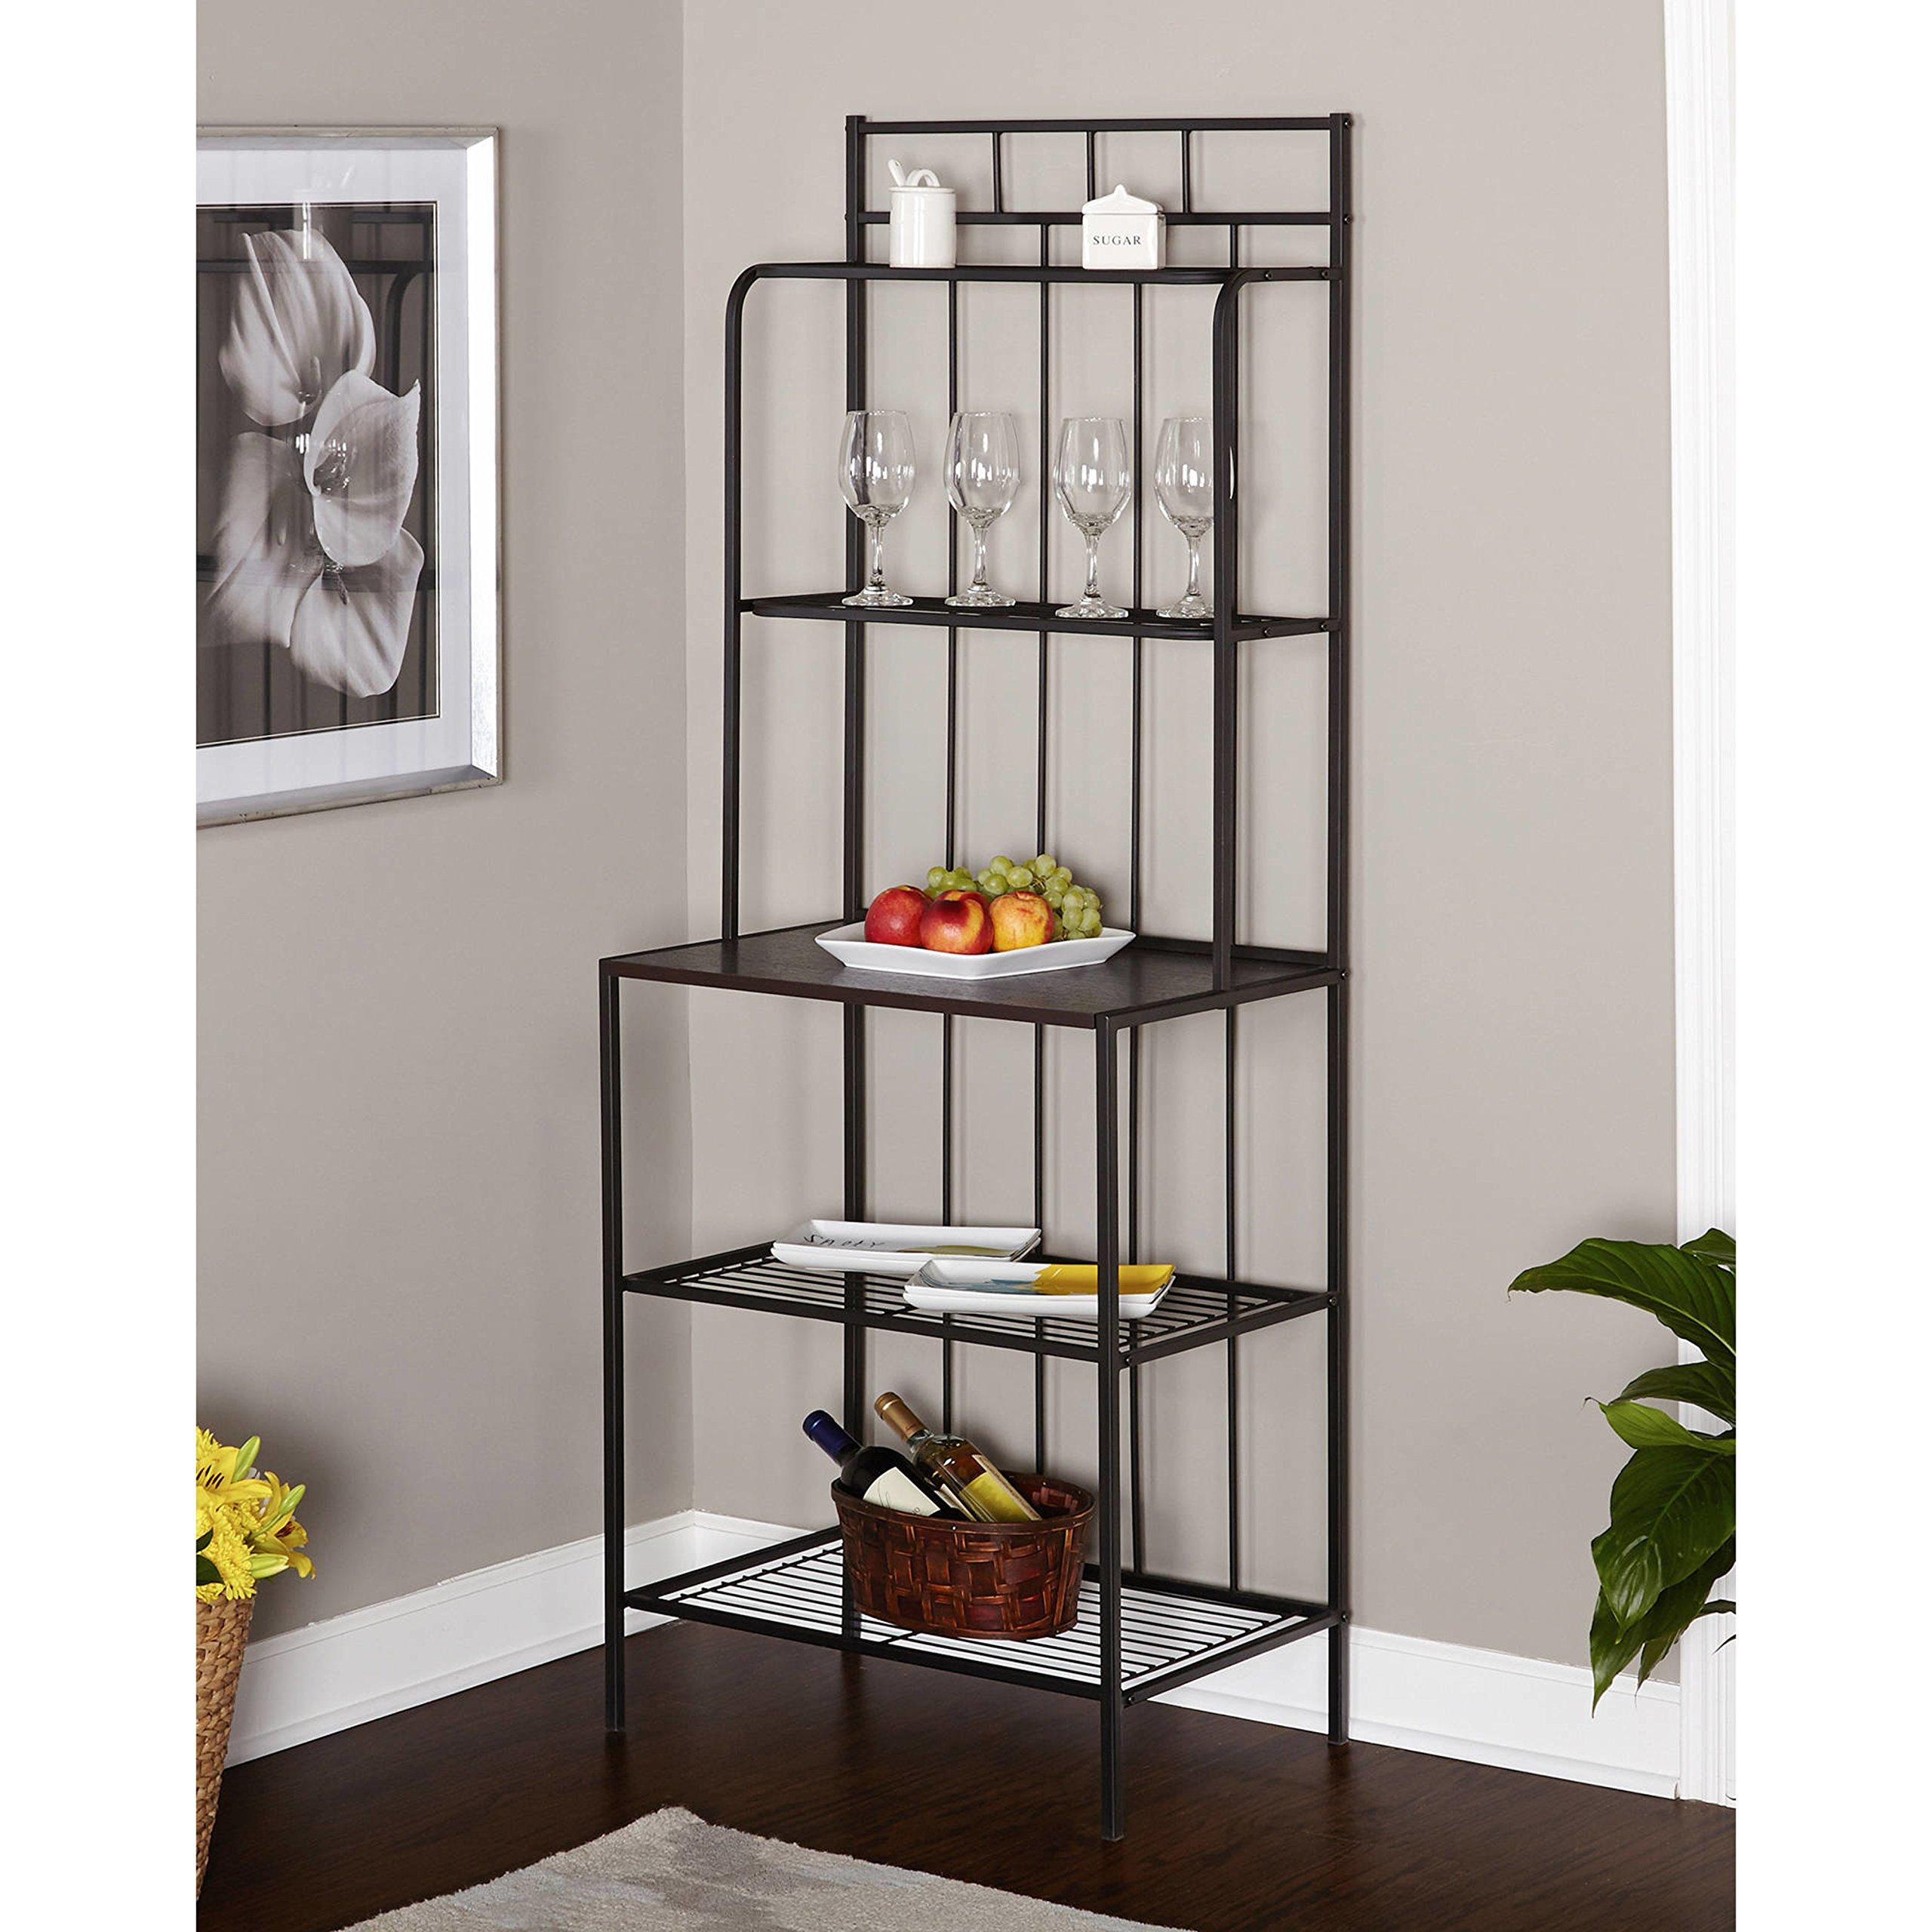 Black Frame With Grey Shelves Kitchen Baker's Rack